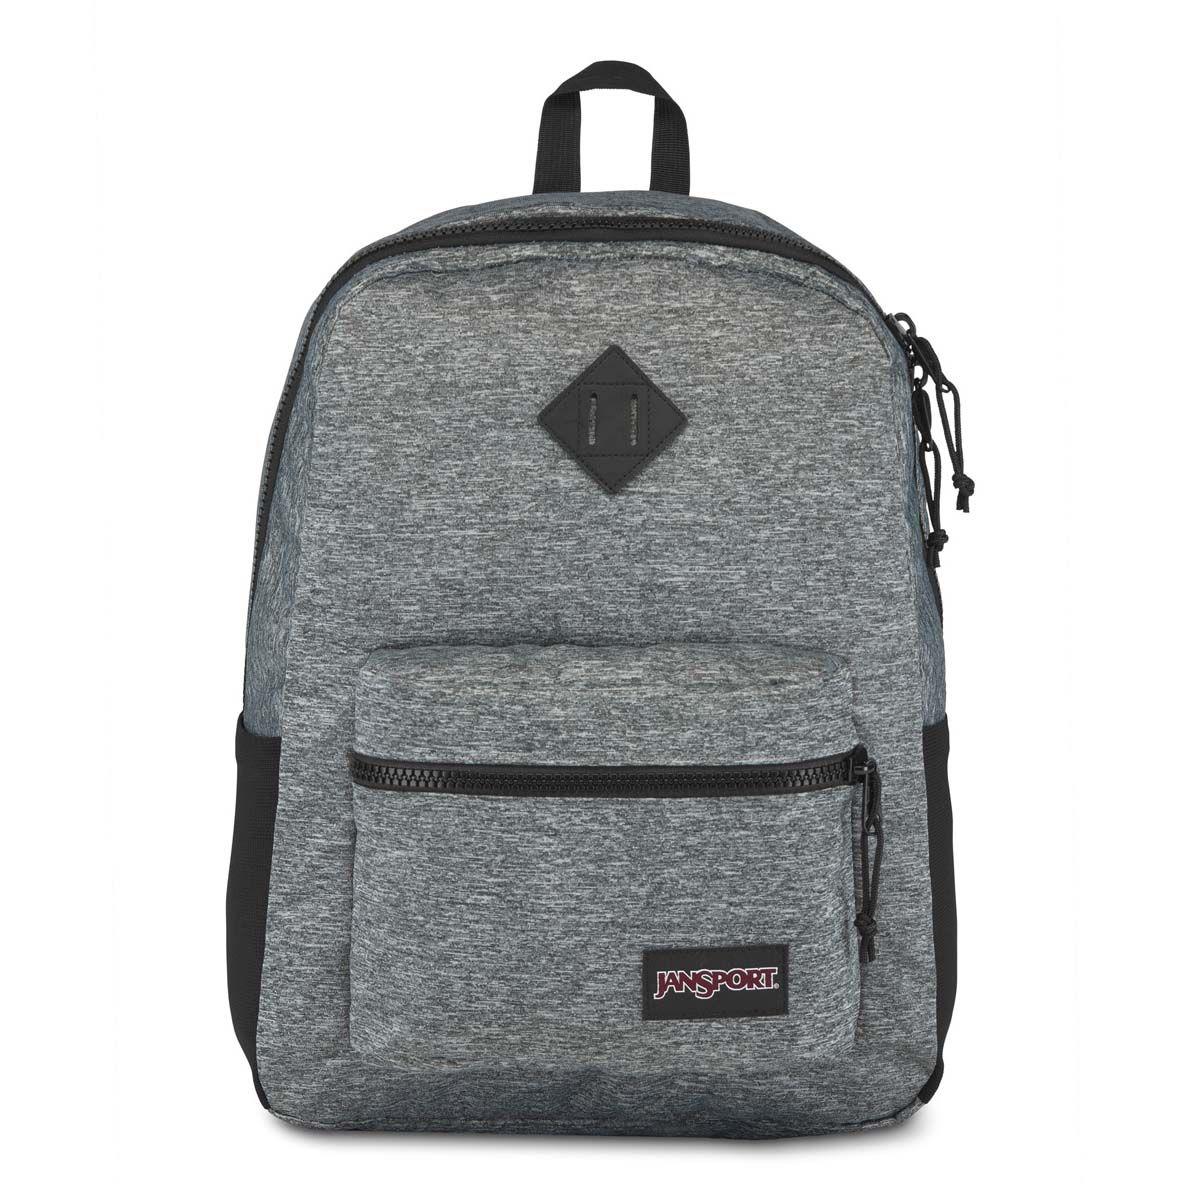 JanSport Sport FX Backpack in Black Woven Knit